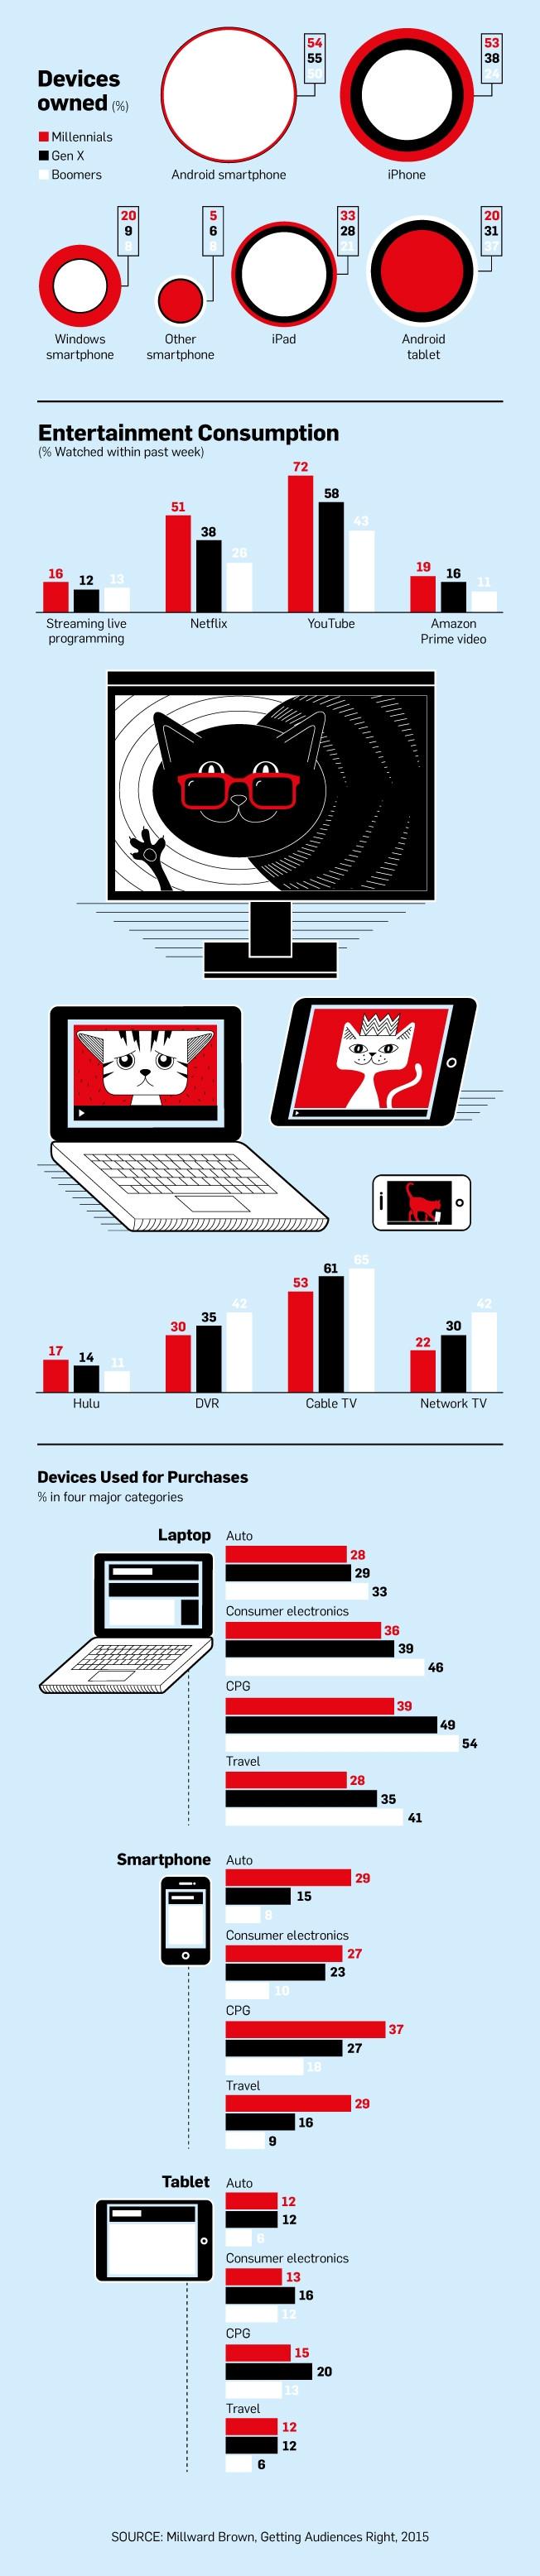 generational-devices-01-2015AdWeek.jpg